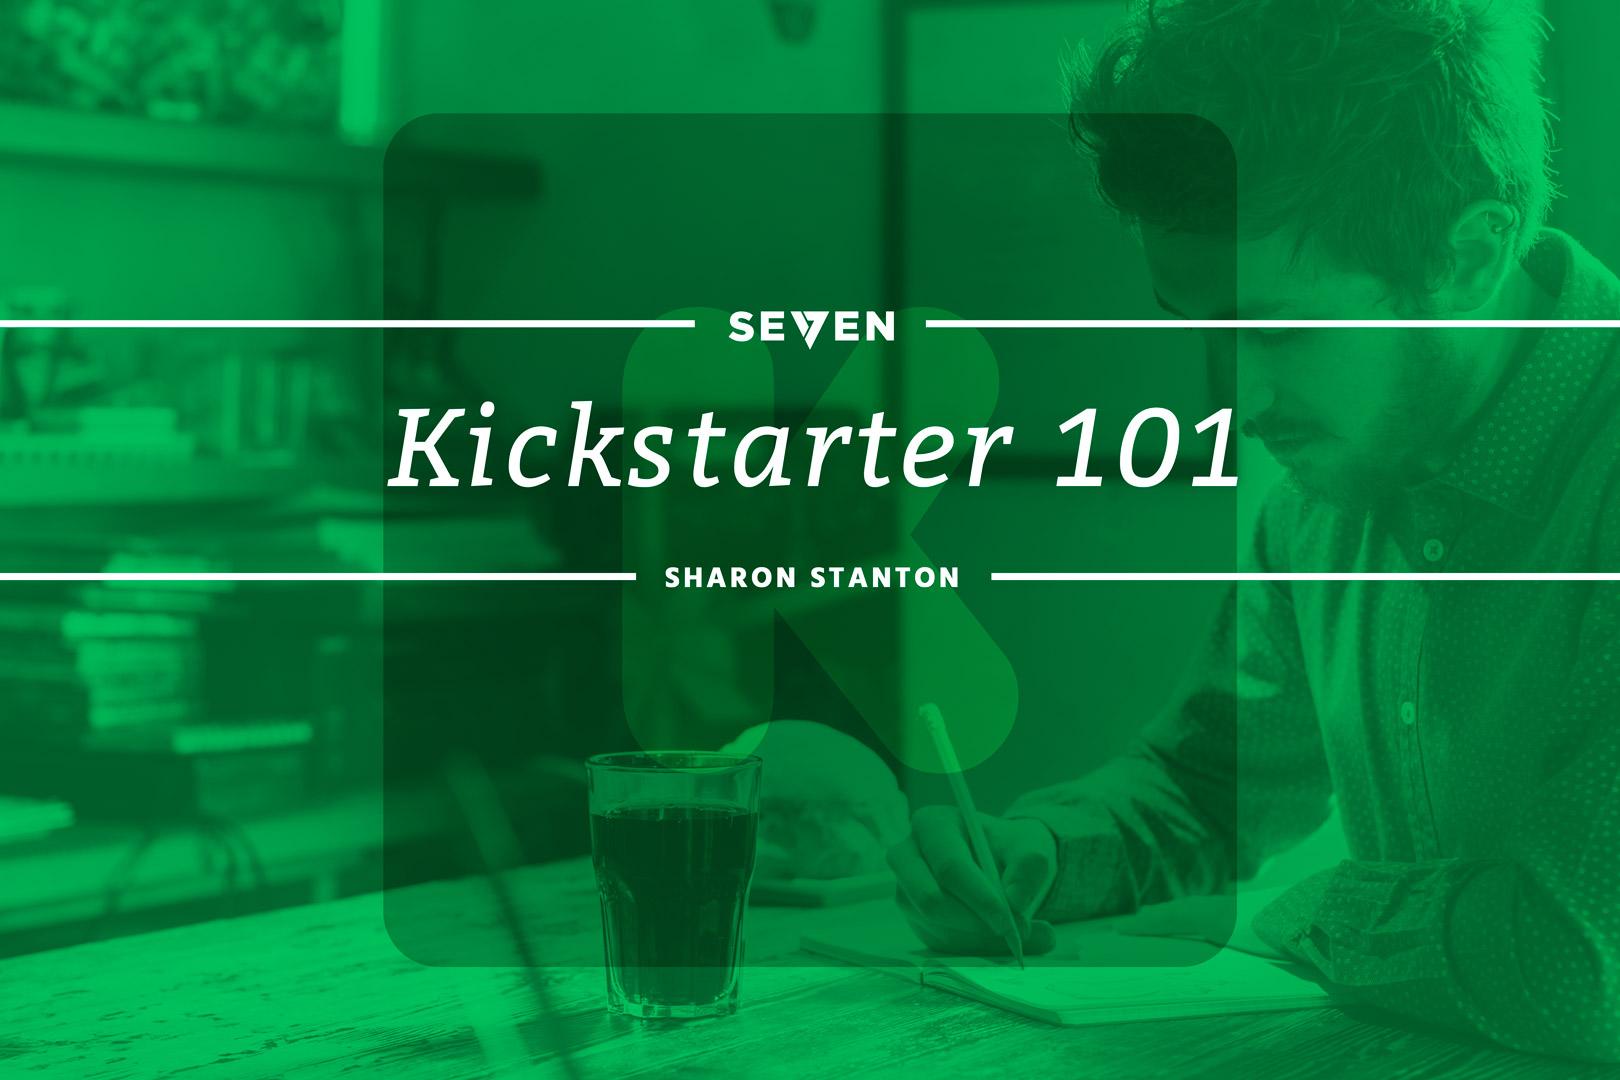 Kickstarter 101